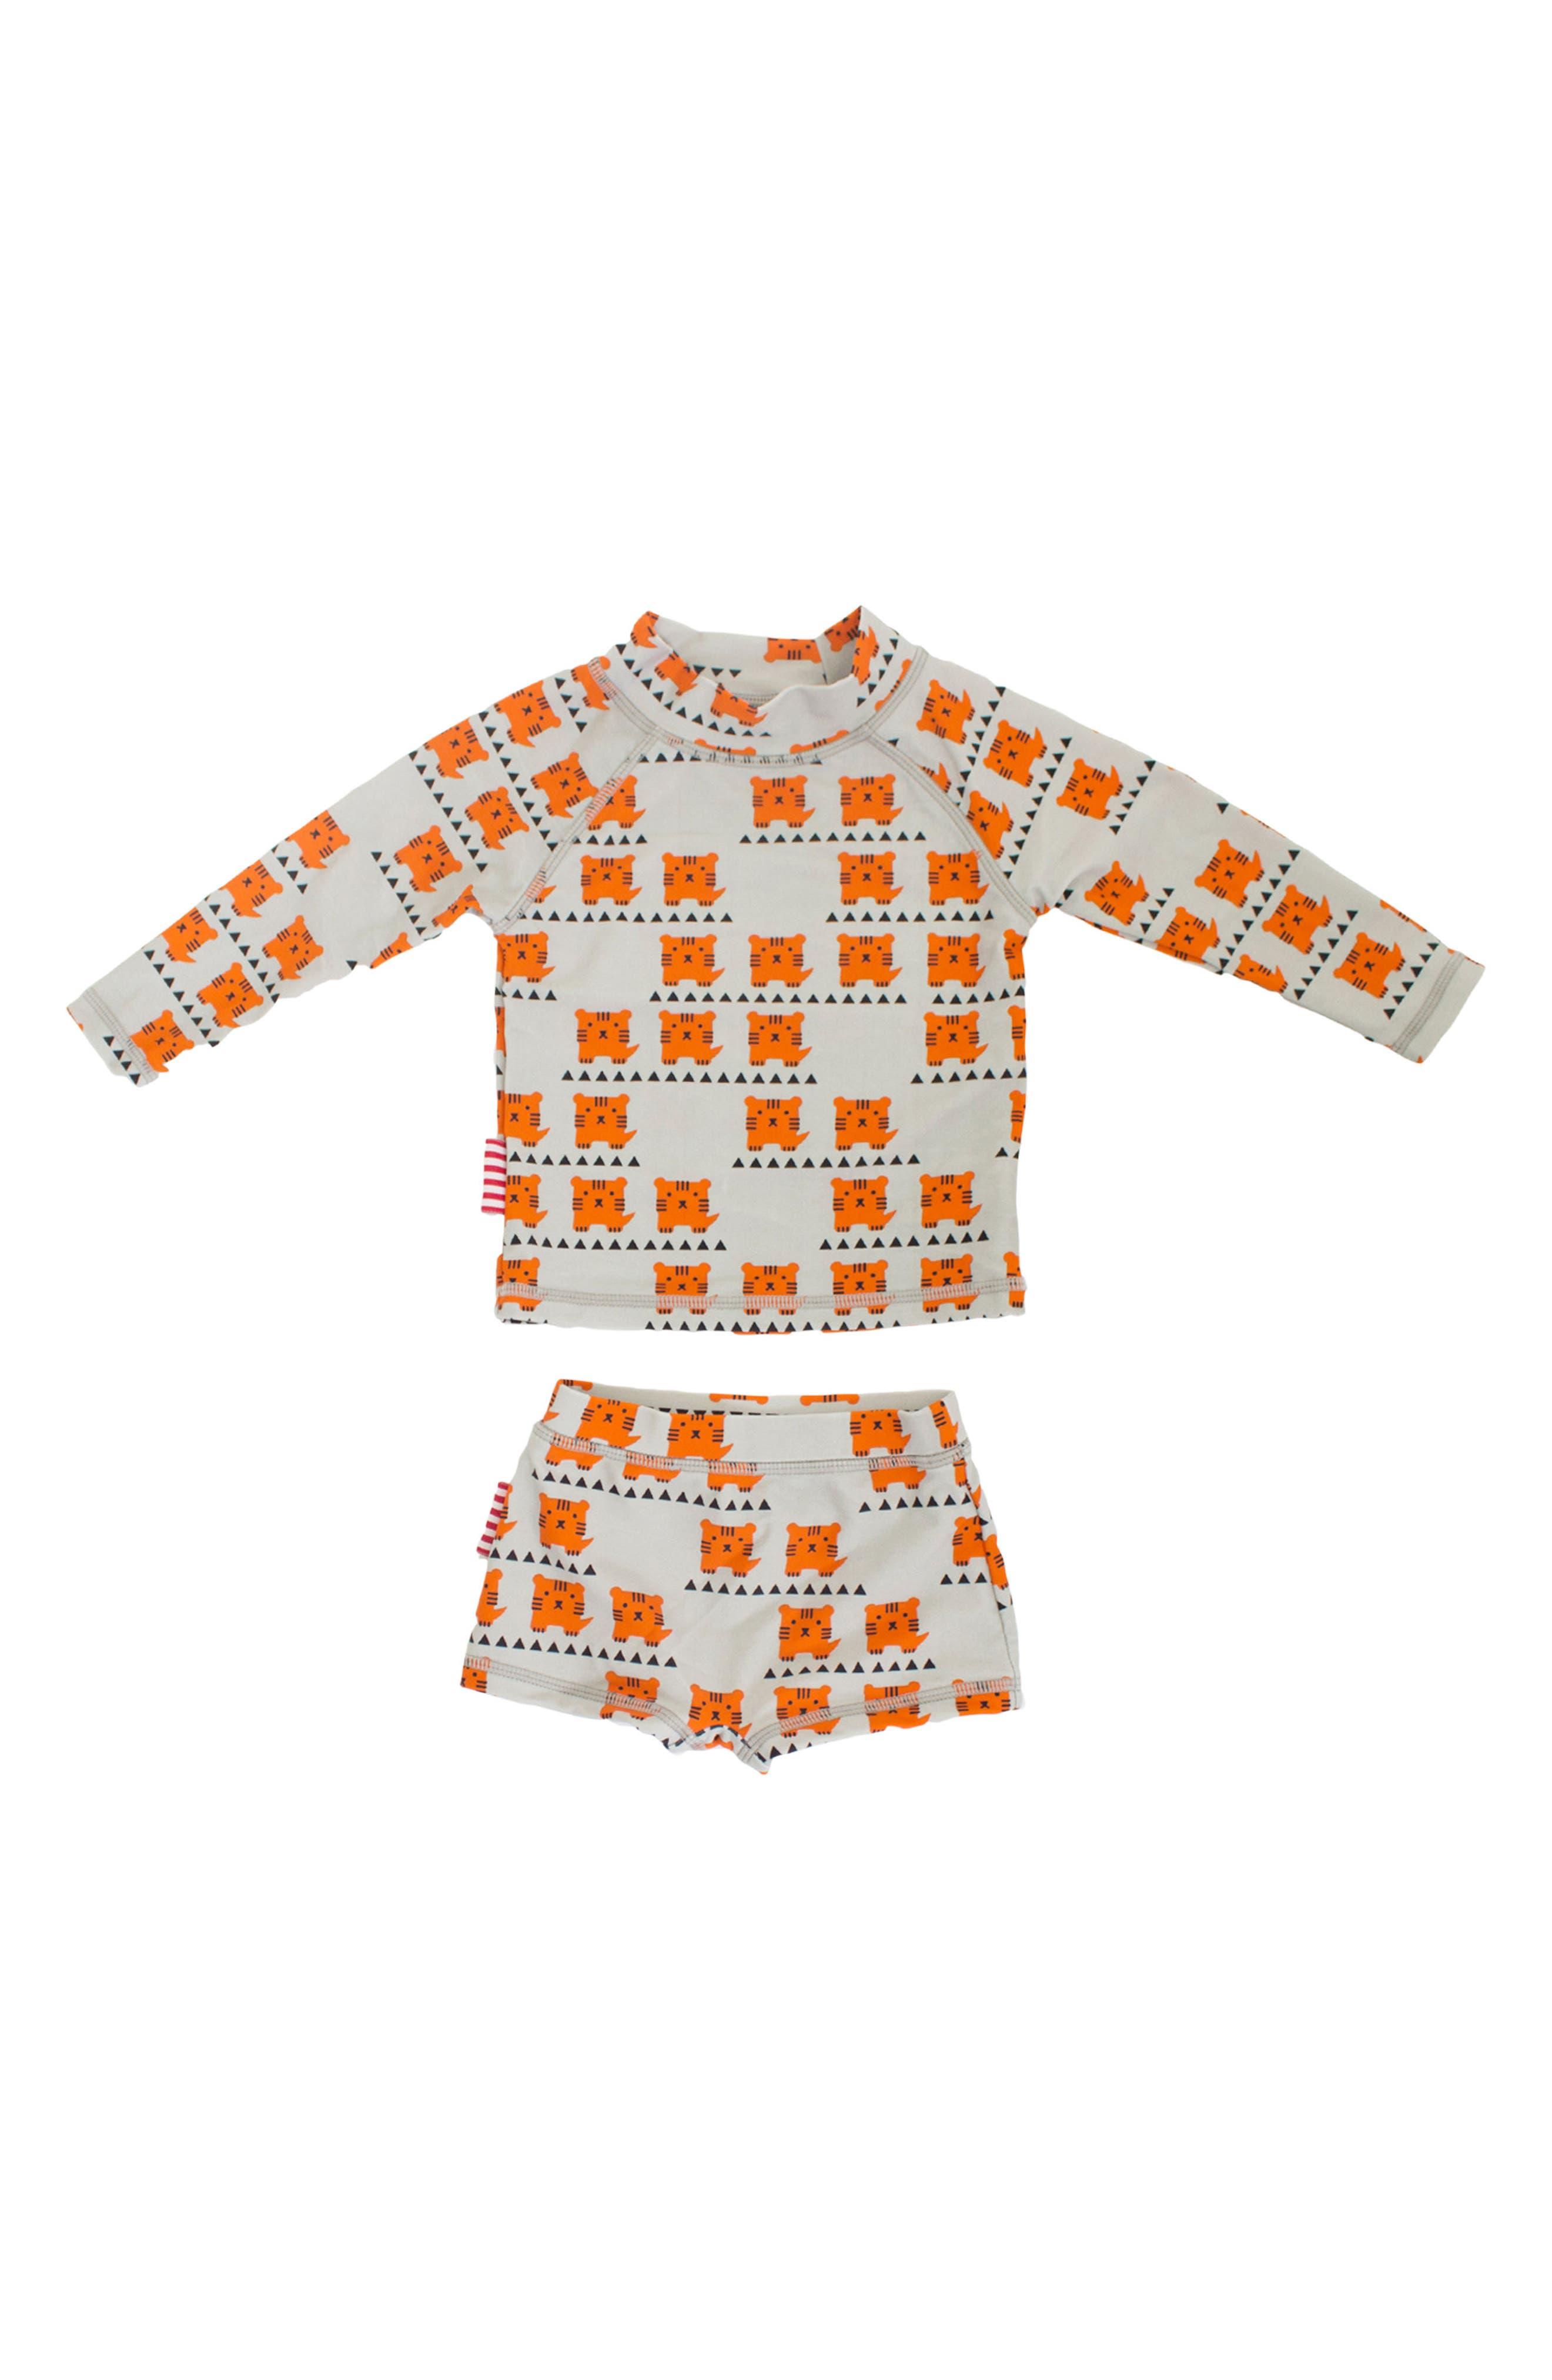 Main Image - SOOKIbaby Cub In The Hub Two-Piece Rashguard Swimsuit (Baby Boys)